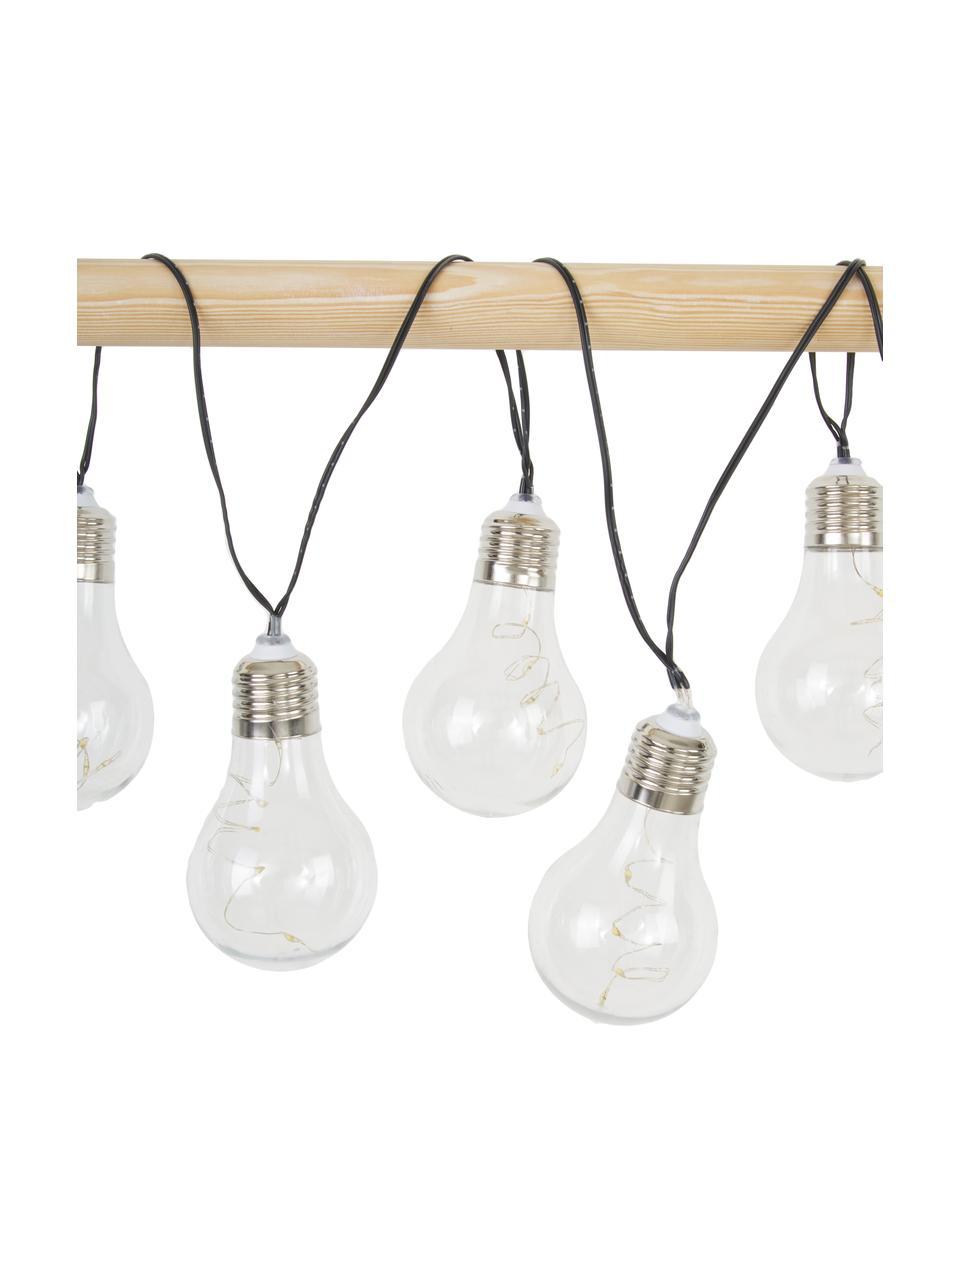 Solar lichtslinger Glow, 390 cm, 10 lampions, Lampions: kunststof, Transparant, L 390 cm